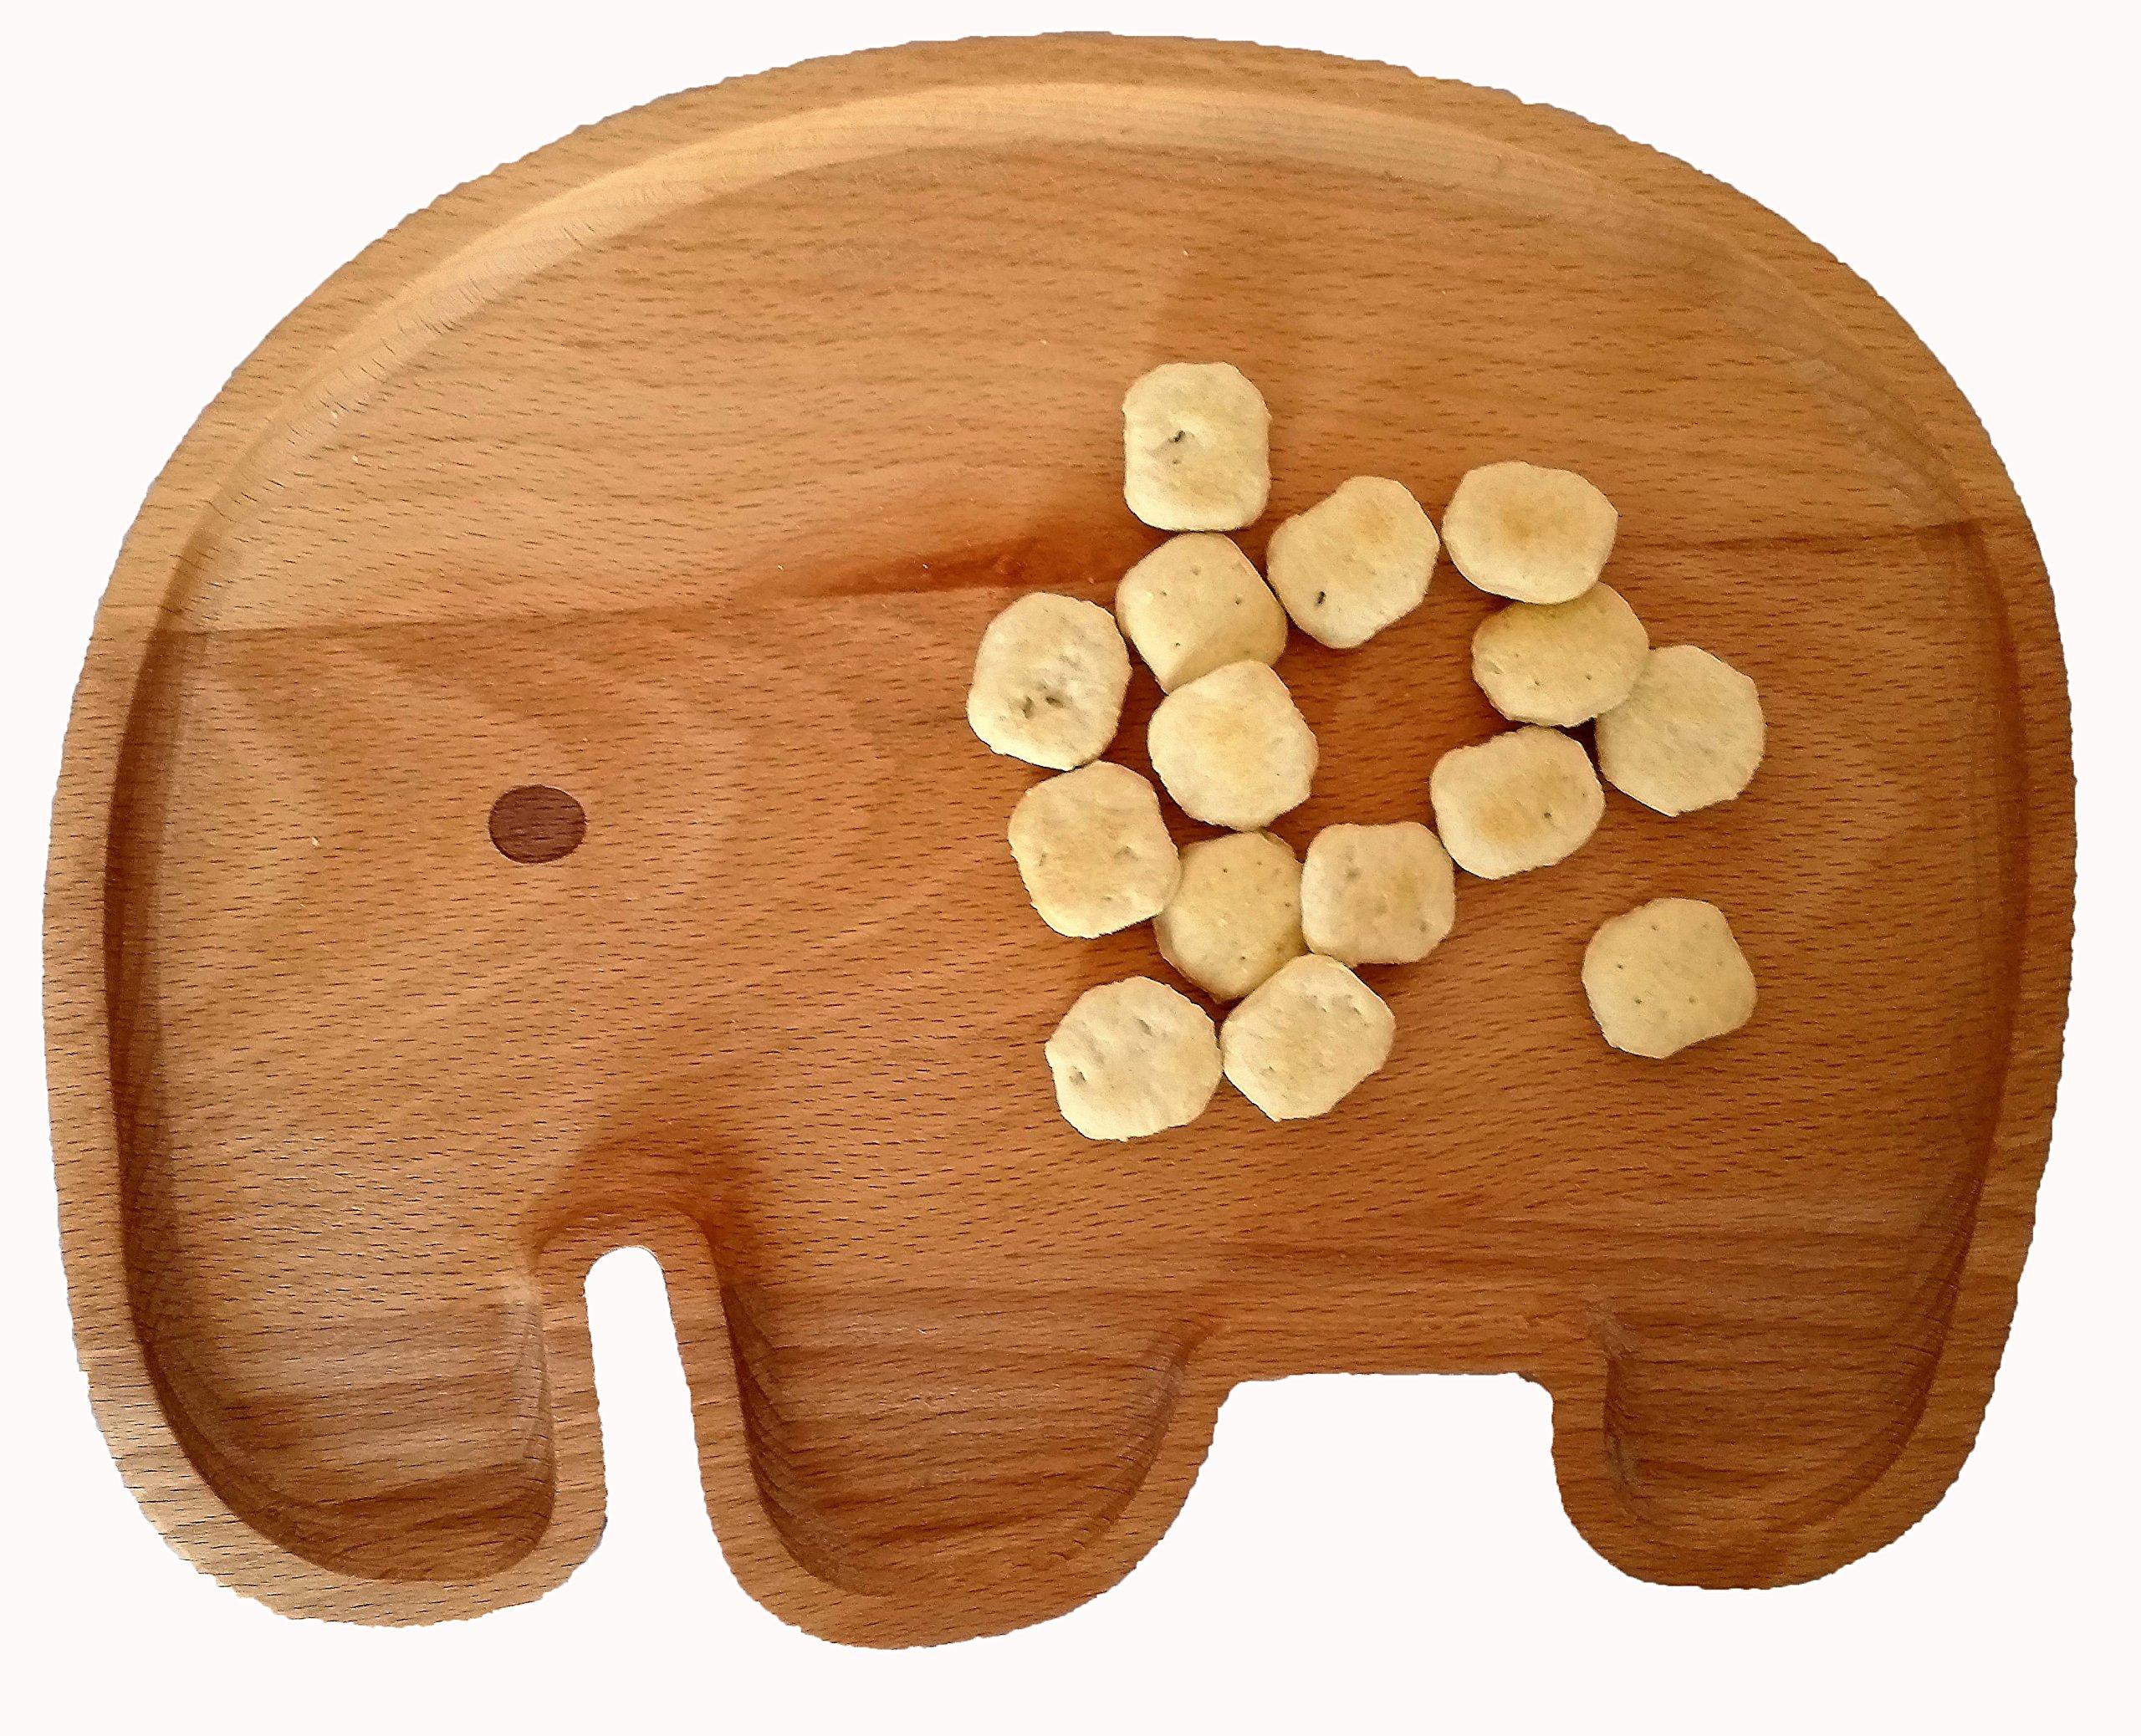 Lifetime Inc Animal Tray Decoration Kids Room Nursery Playroom Kitchen Sunroom Hallway Entrance Decore 3D Natural Wood Whimsical (Elephant)